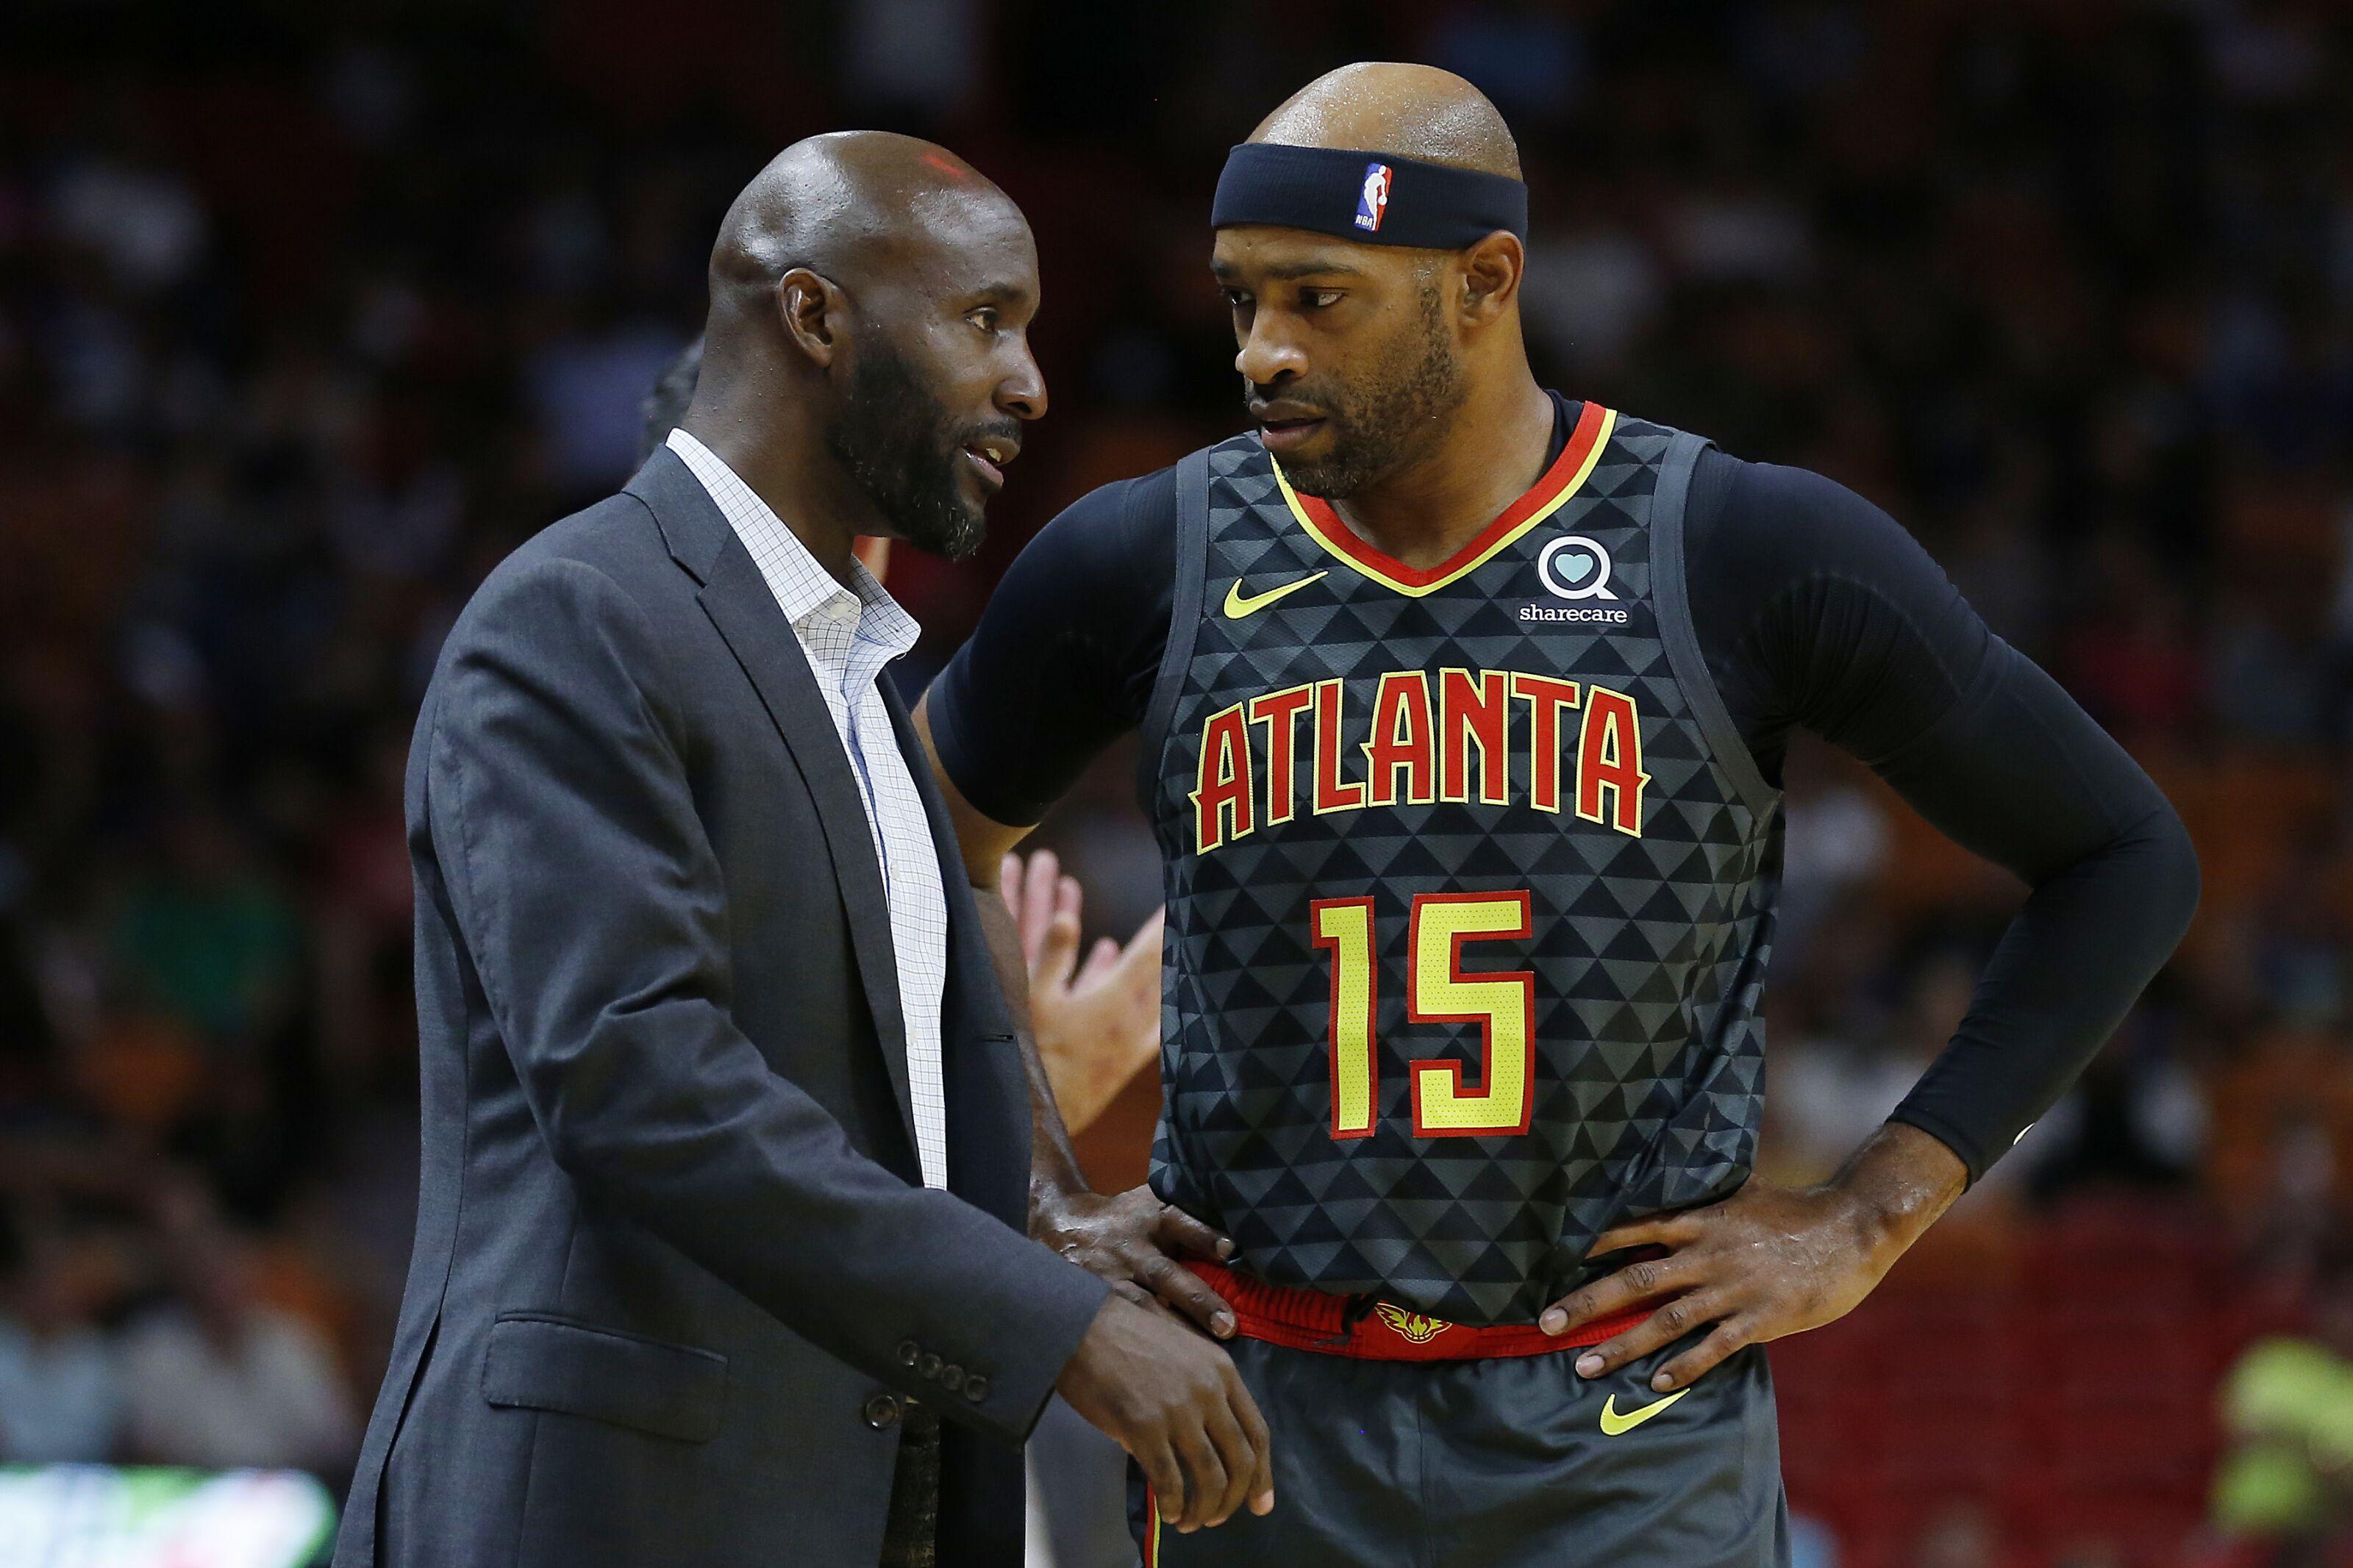 Atlanta Hawks: Vince Carter Wants to Appear in All 82 Games in 2019-20